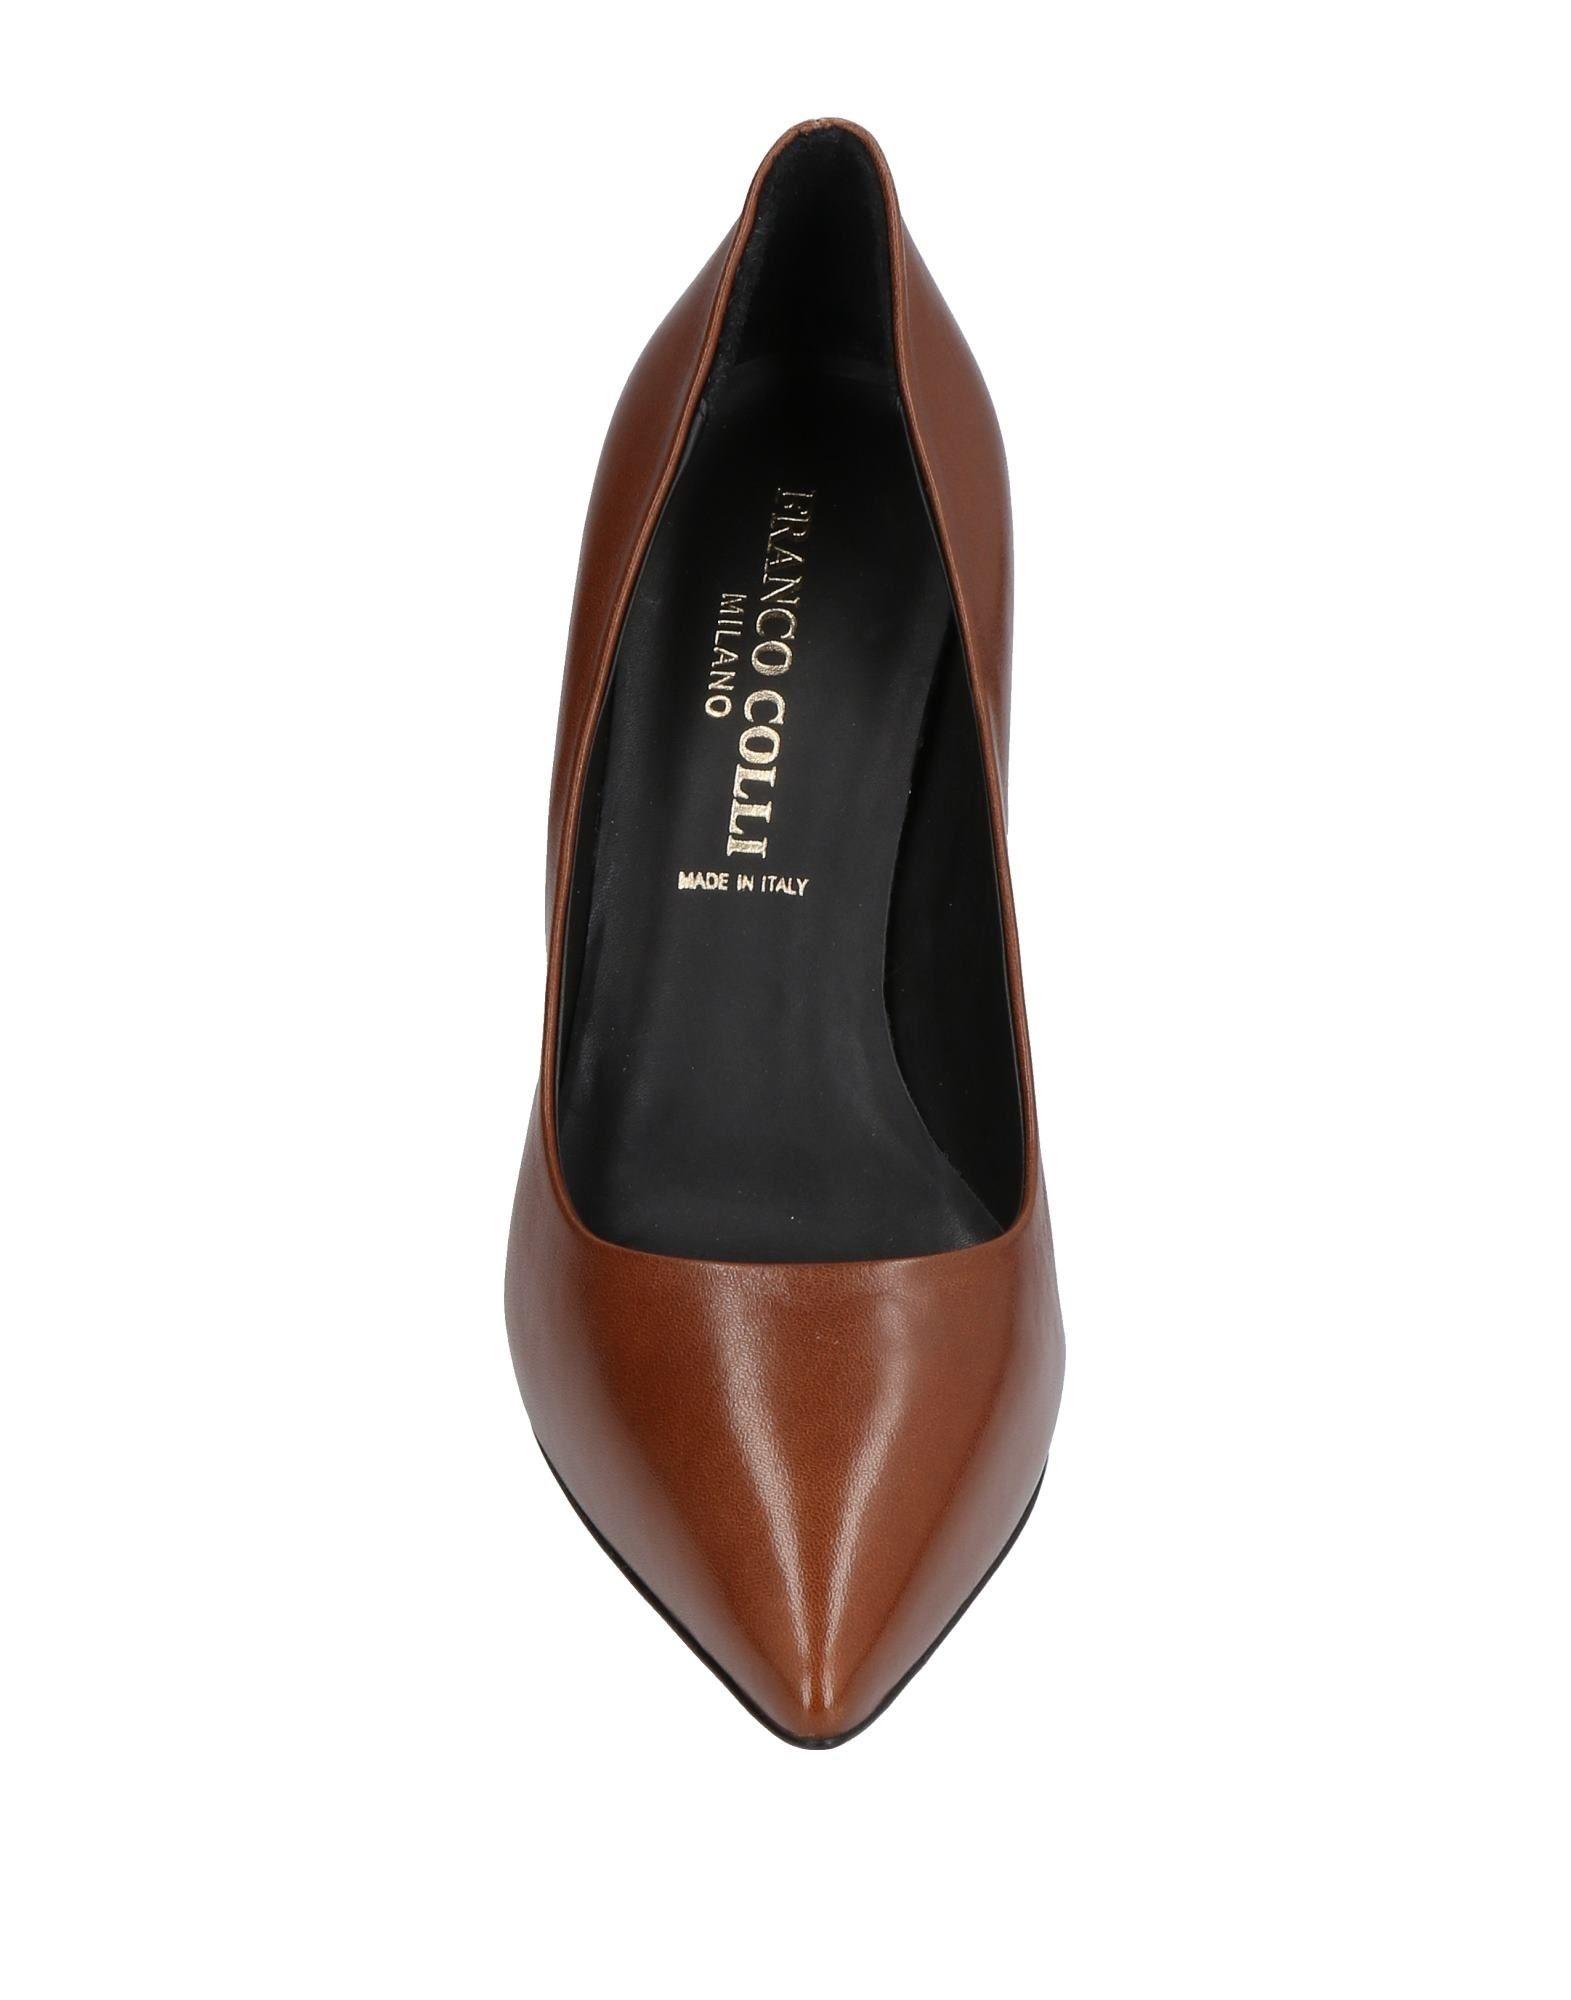 Franco Colli Pumps Damen beliebte  11471535JO Gute Qualität beliebte Damen Schuhe b55ef8